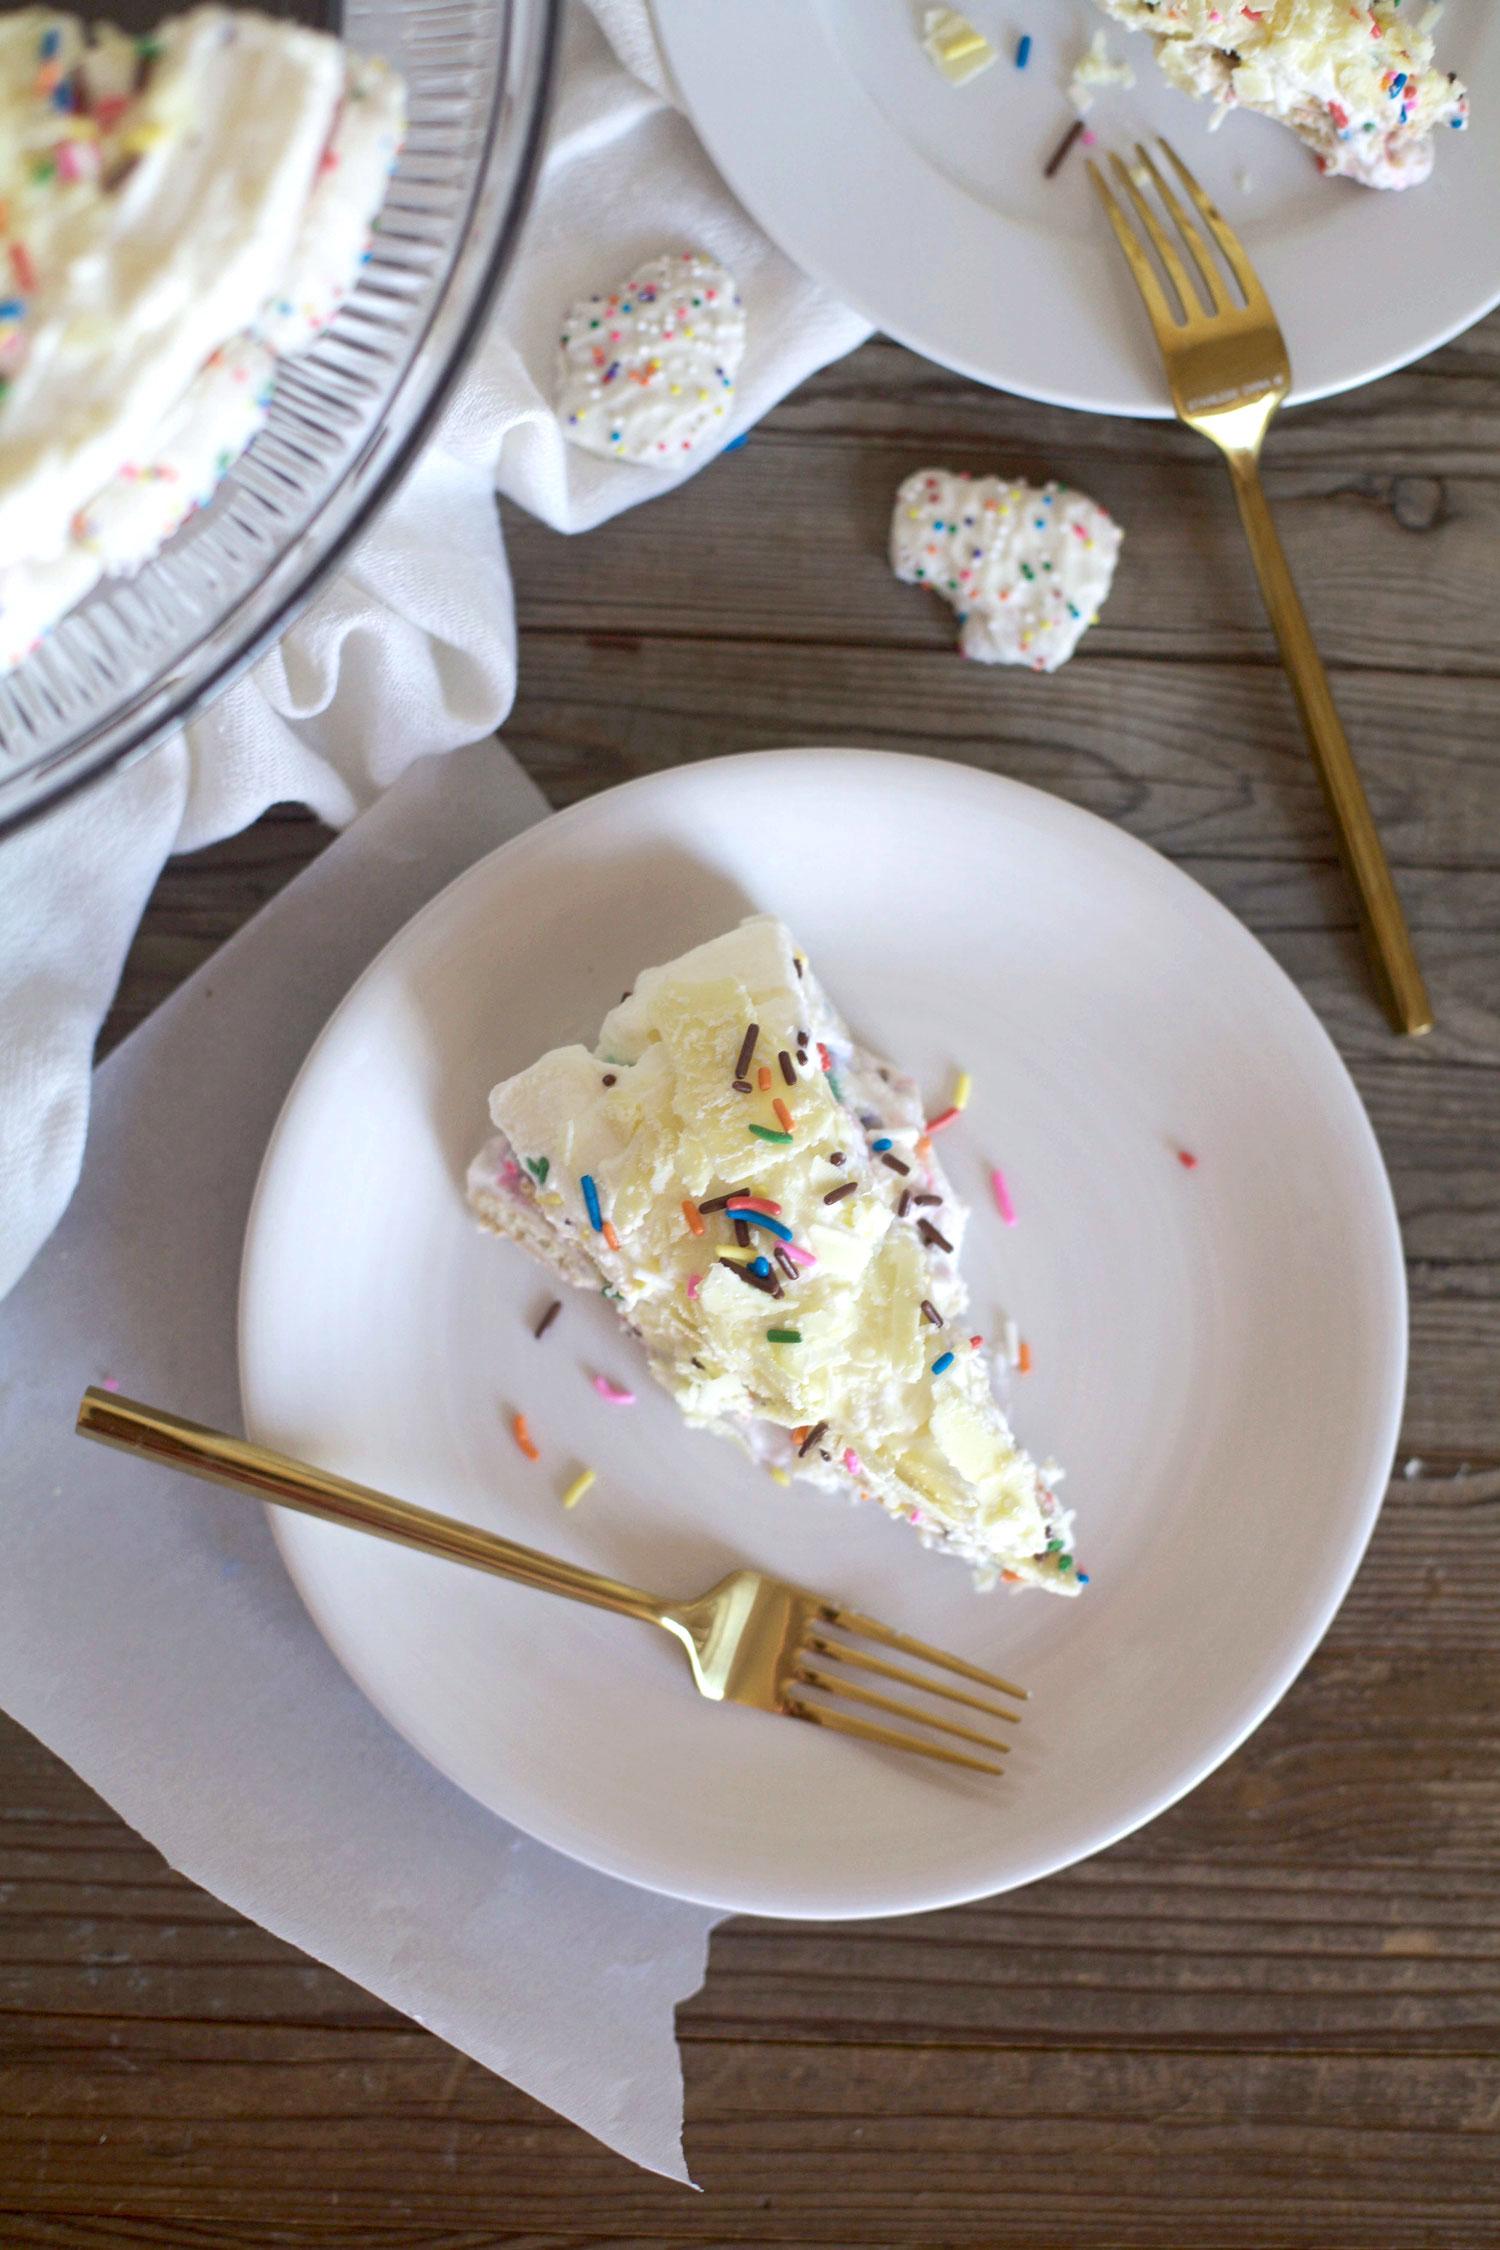 Frosted-Animal-Cracker-Ice-Box-Cake6.jpg